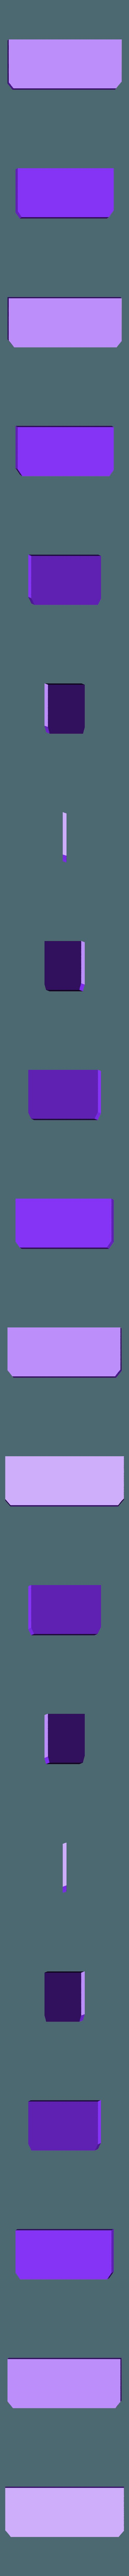 goggle-lid.stl Download free 3MF file Watchmen NeoPixel Goggles • 3D printable model, Adafruit